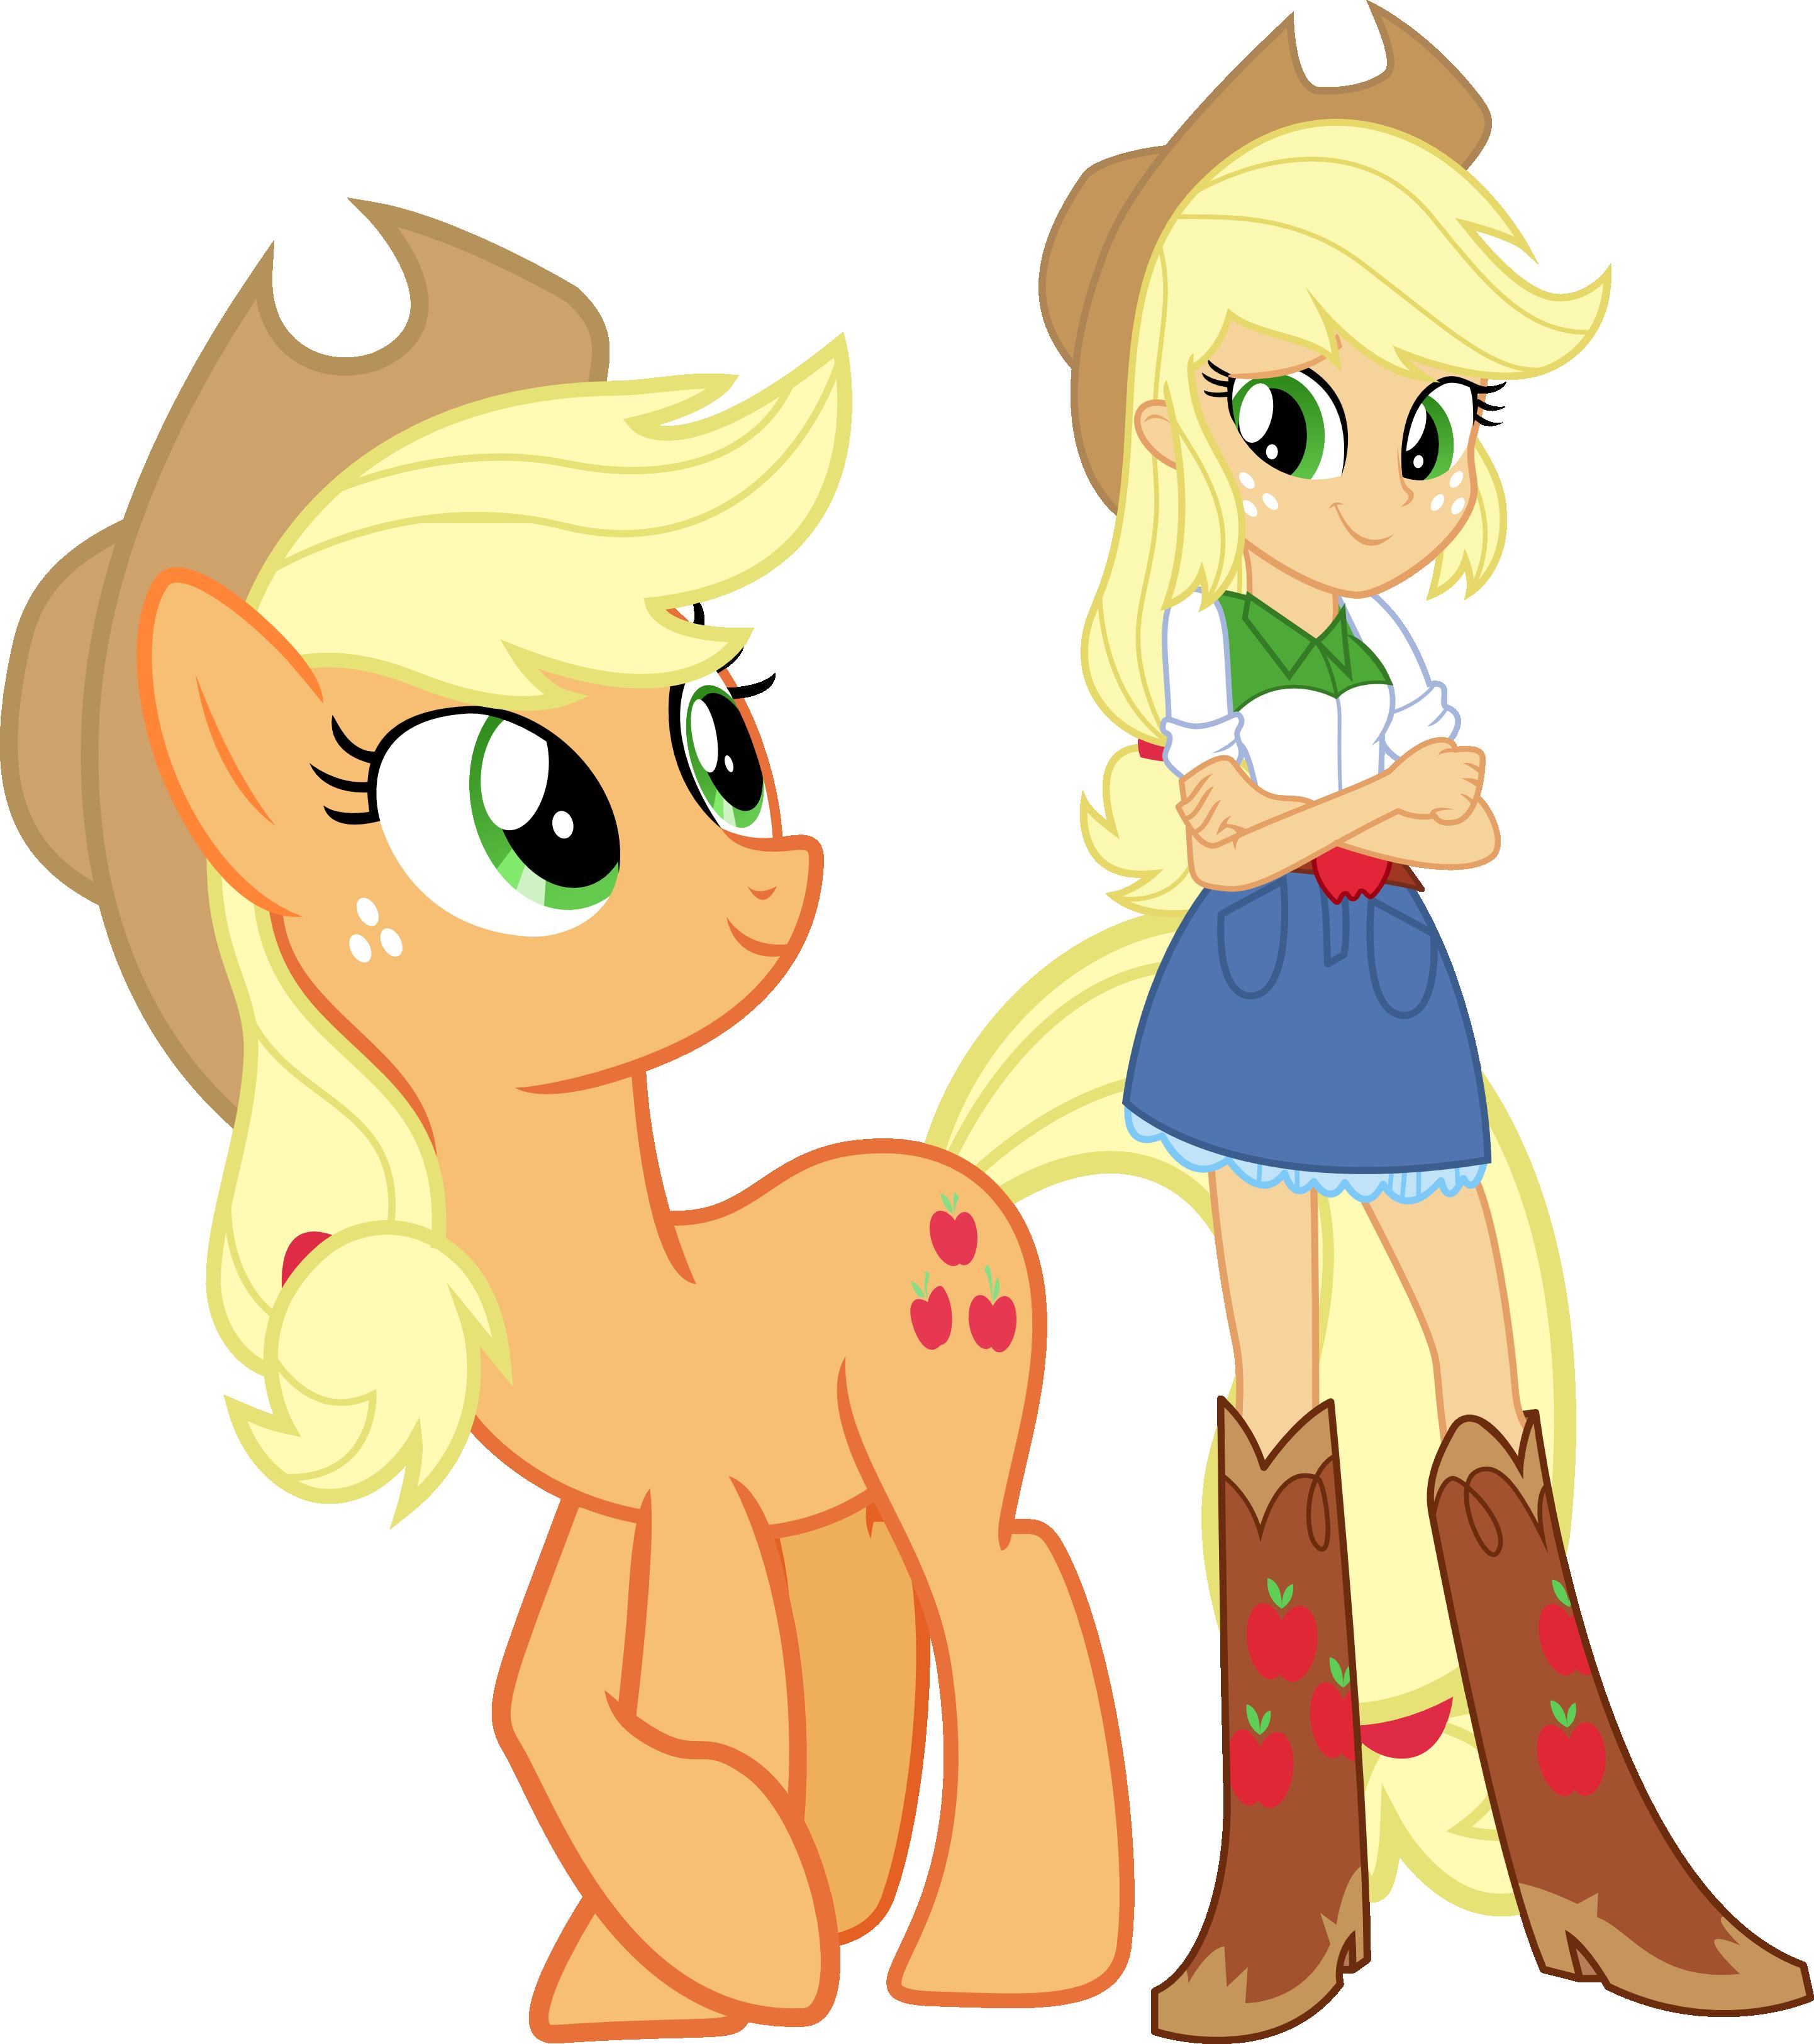 Applejack and applejack by vector brony on deviantart - My little pony en humain ...